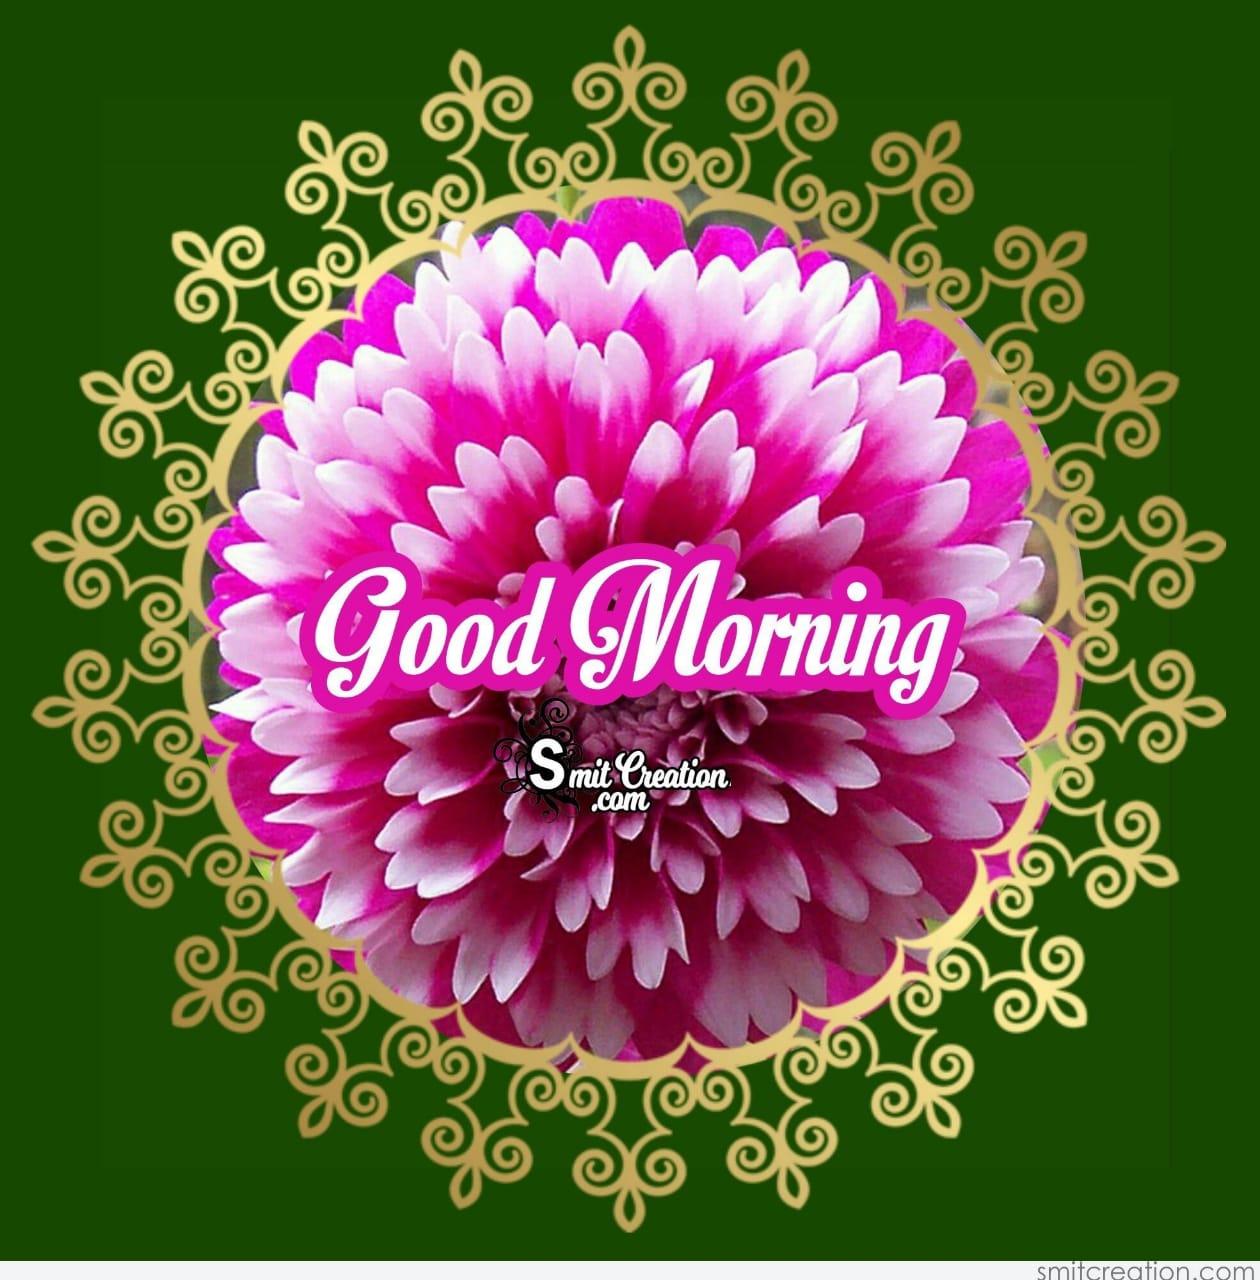 Good Morning Image Rockey Sharechat Funny Romantic